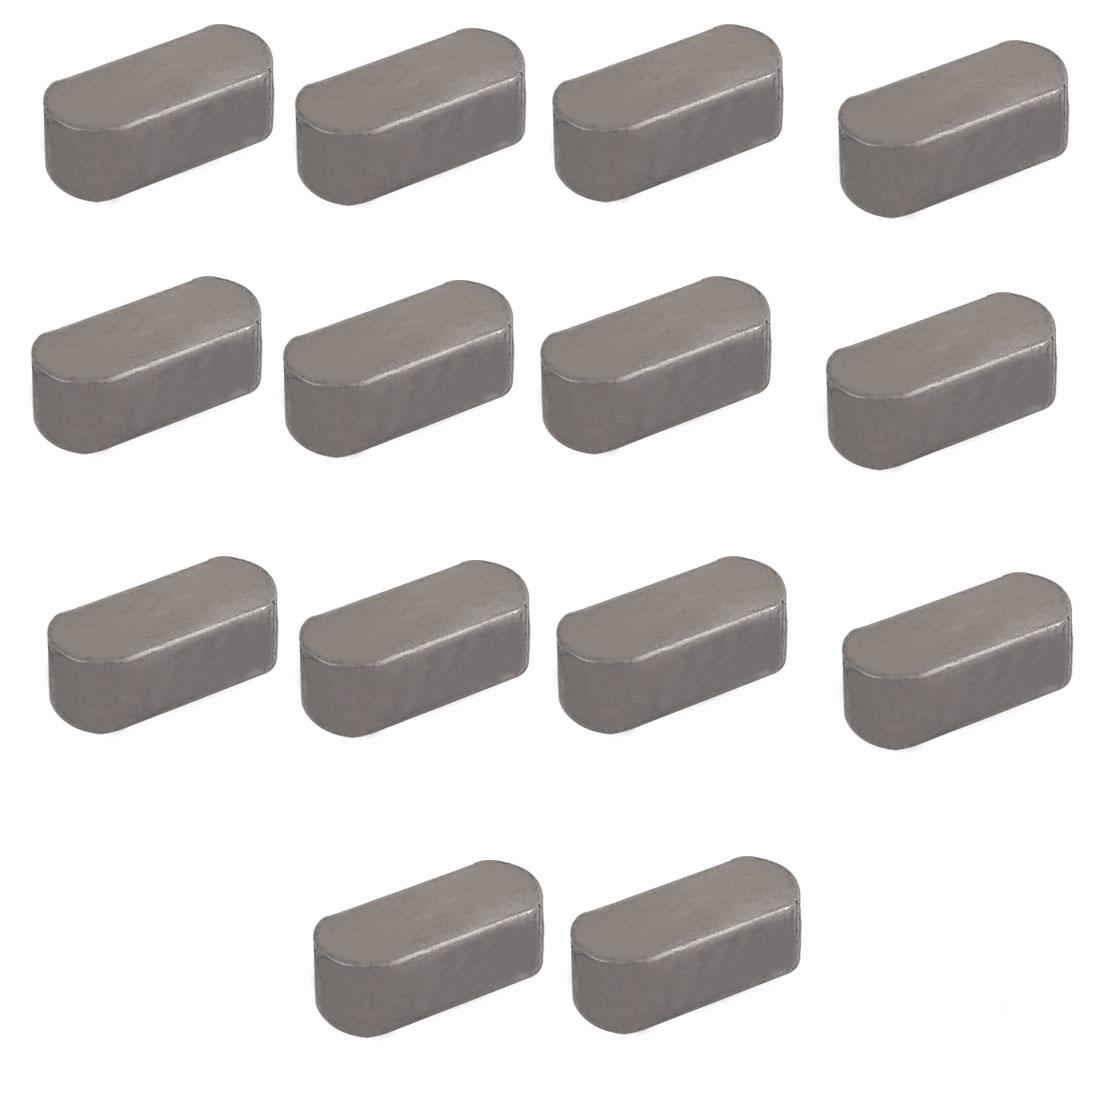 20mmx8mmx7mm Carbon Steel Key Stock To Lock Pulleys 14pcs